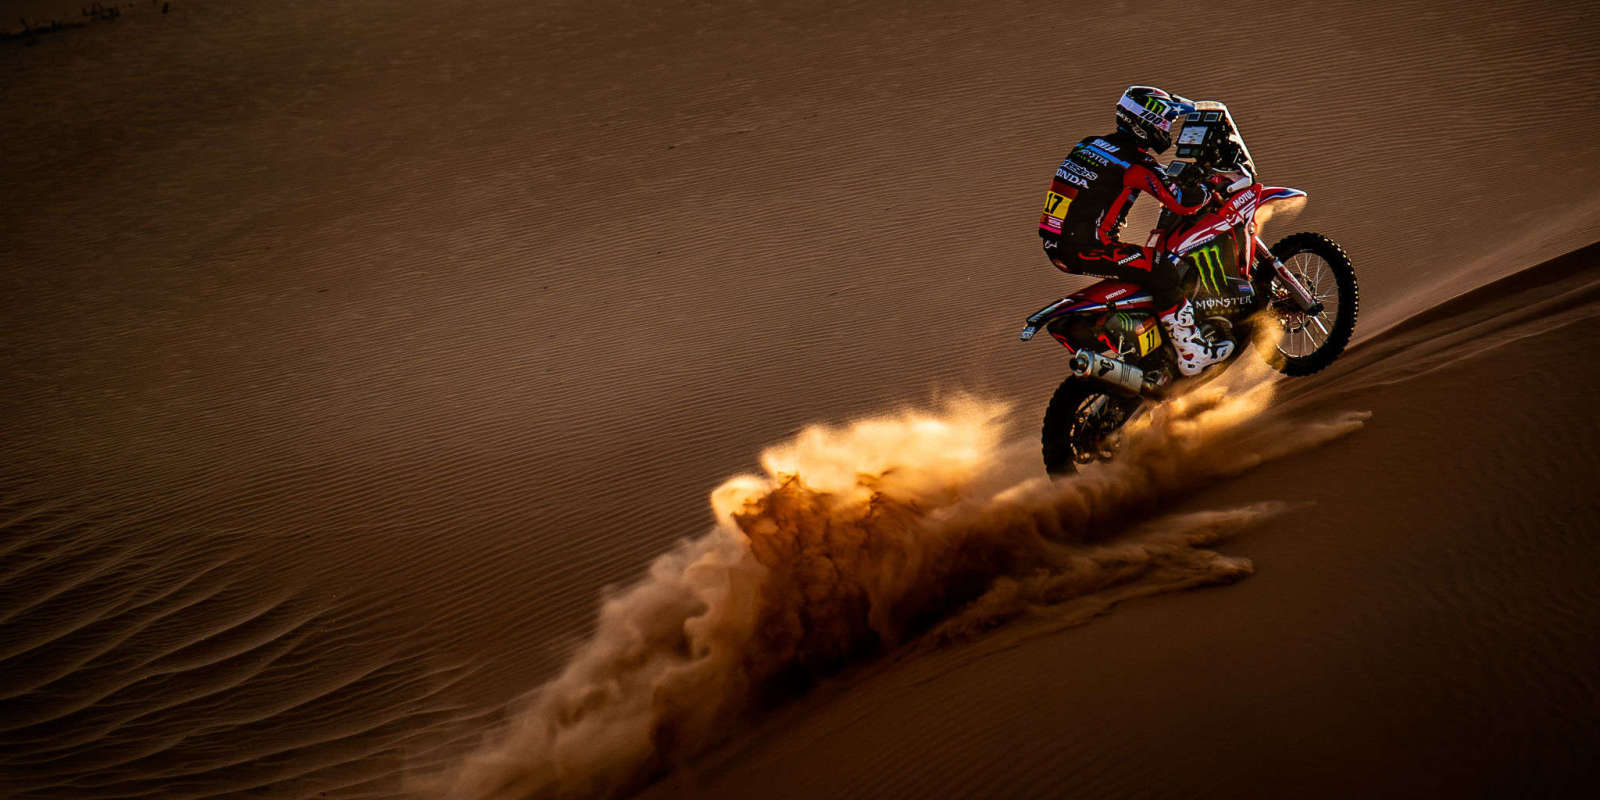 Cornejo during Dakar Rally